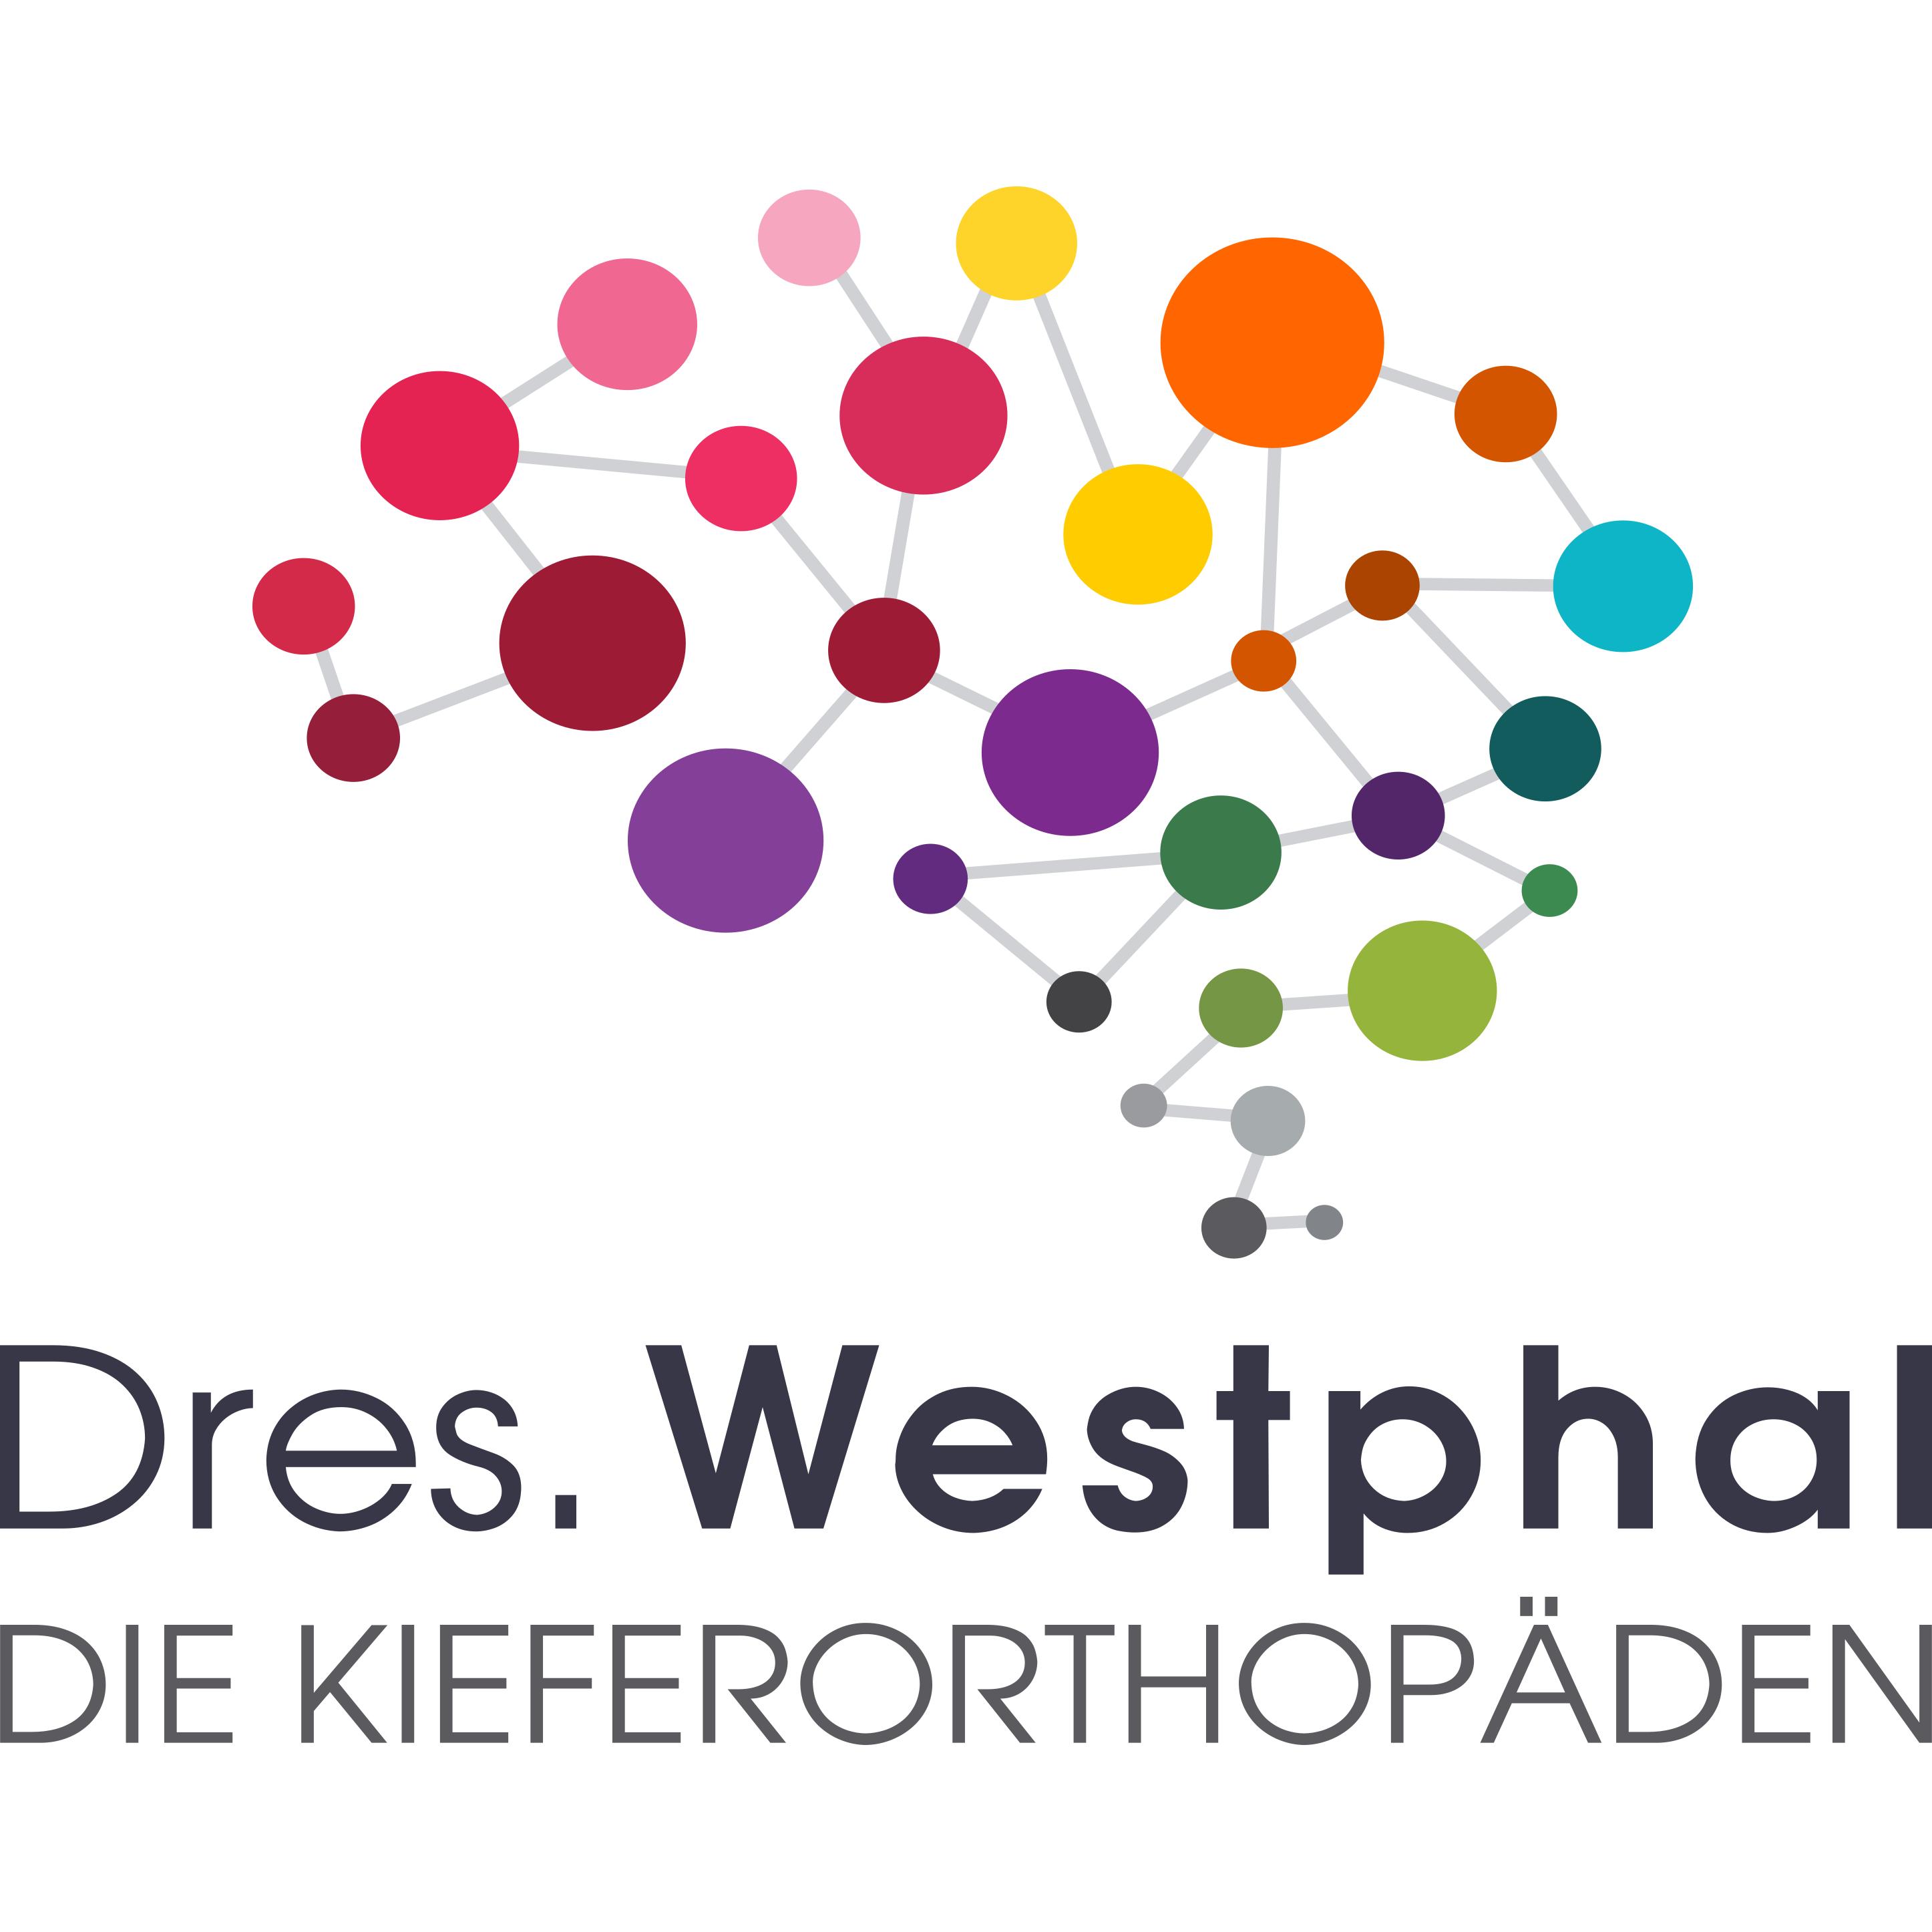 Praxis Dr. J.-O. Westphal & Dr. M. Westphal